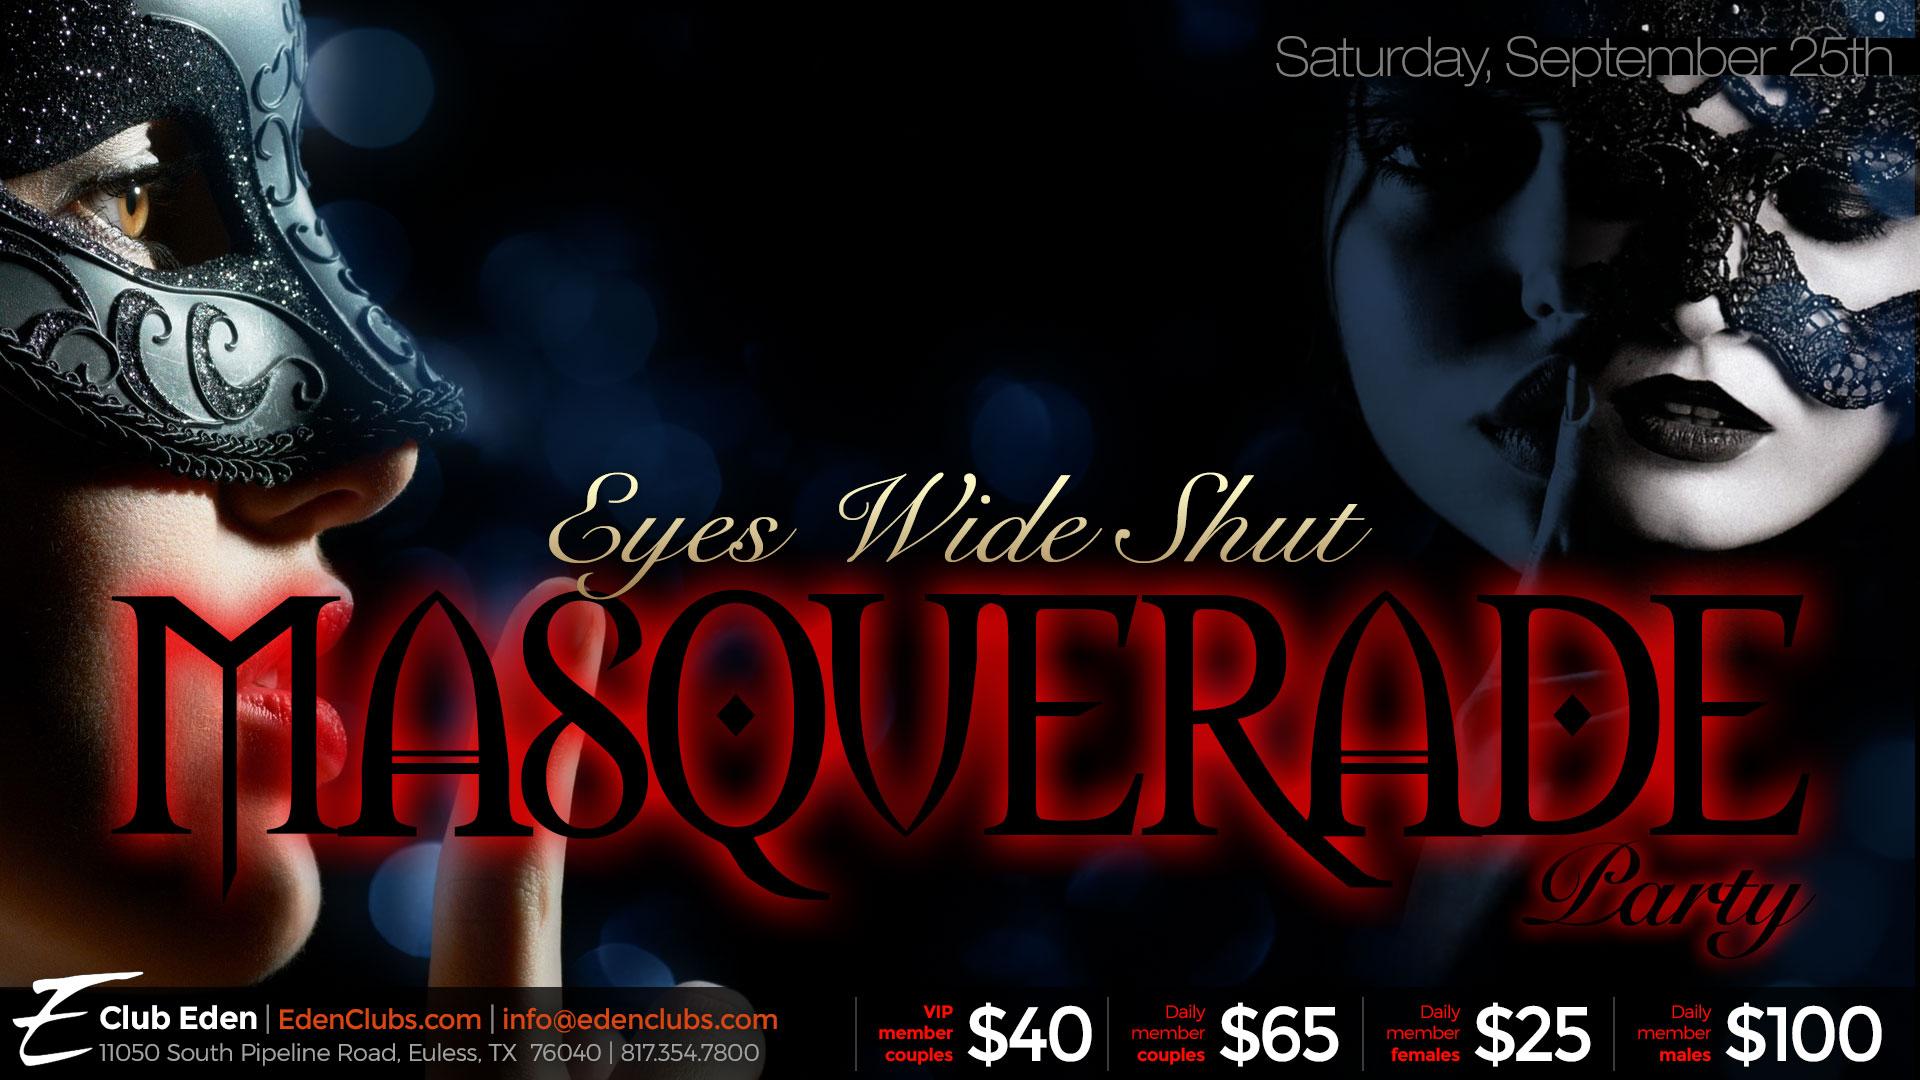 092521-Masquerade-eden-dfw-tv